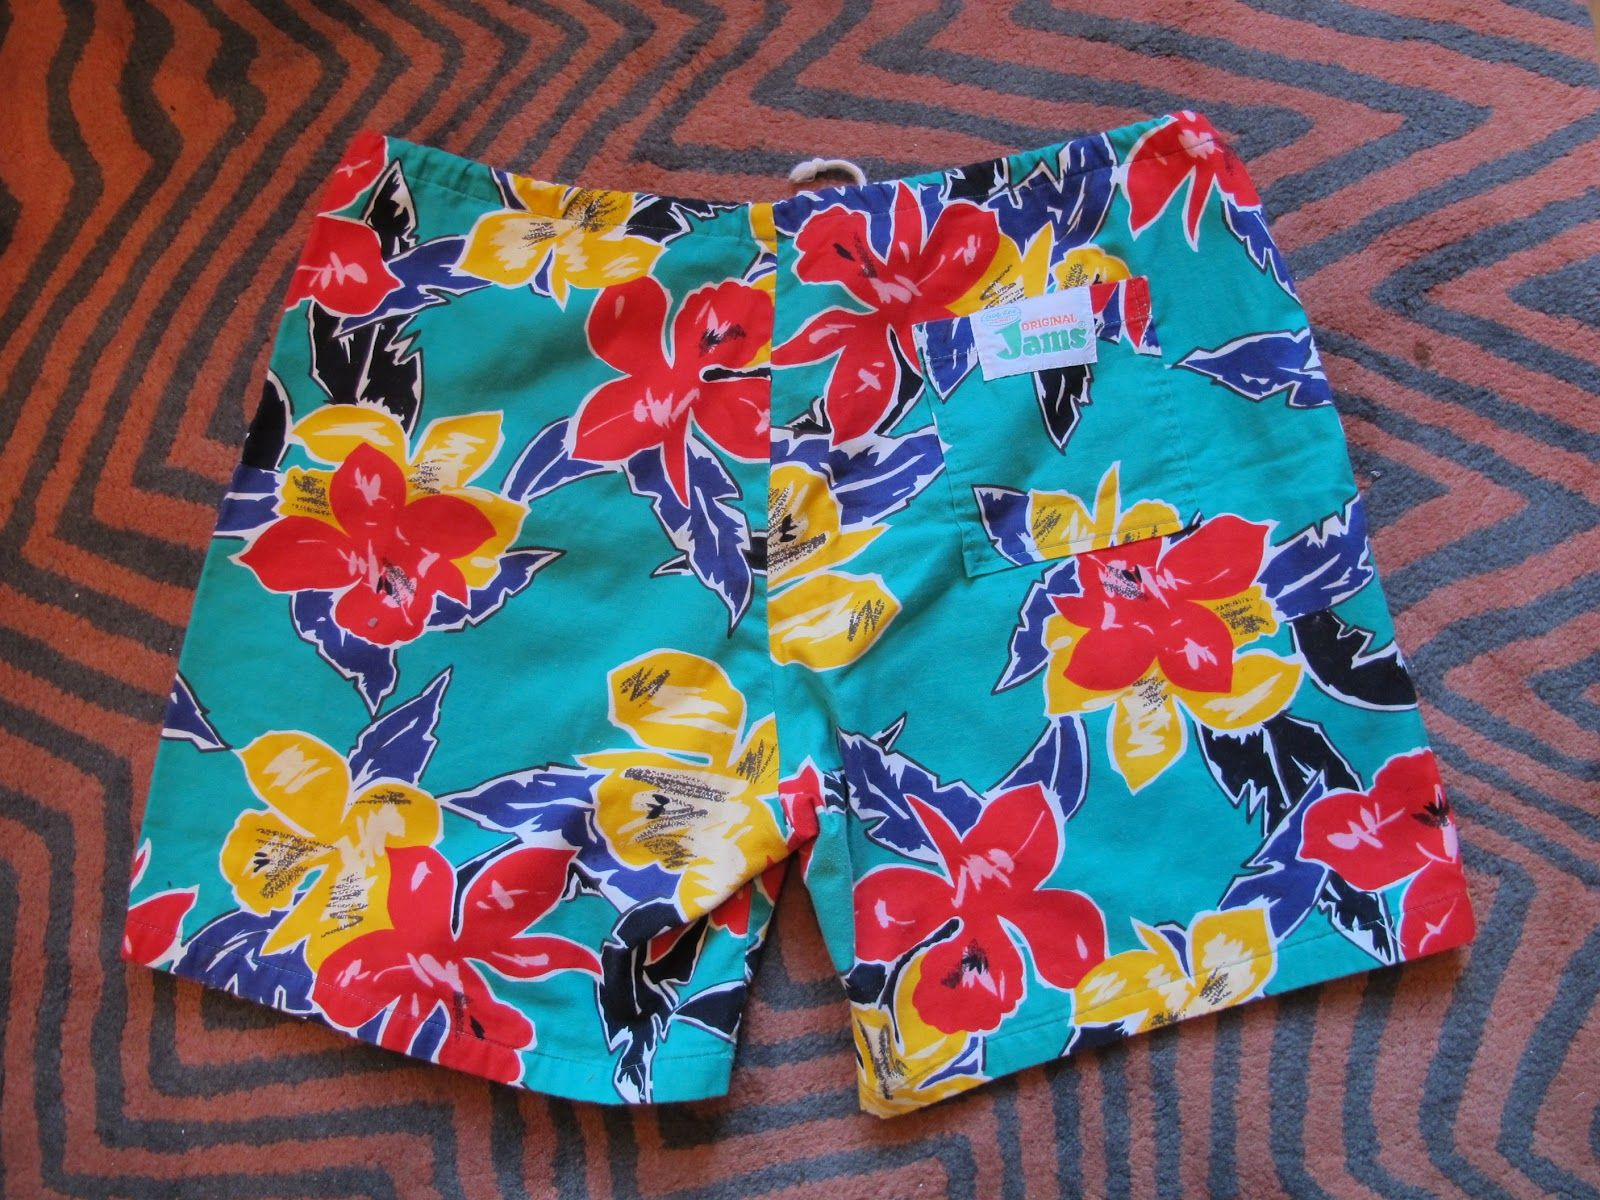 8b973c7e1e Original Jams shorts from the 80s | Time Capsule | Fashion, 80s ...